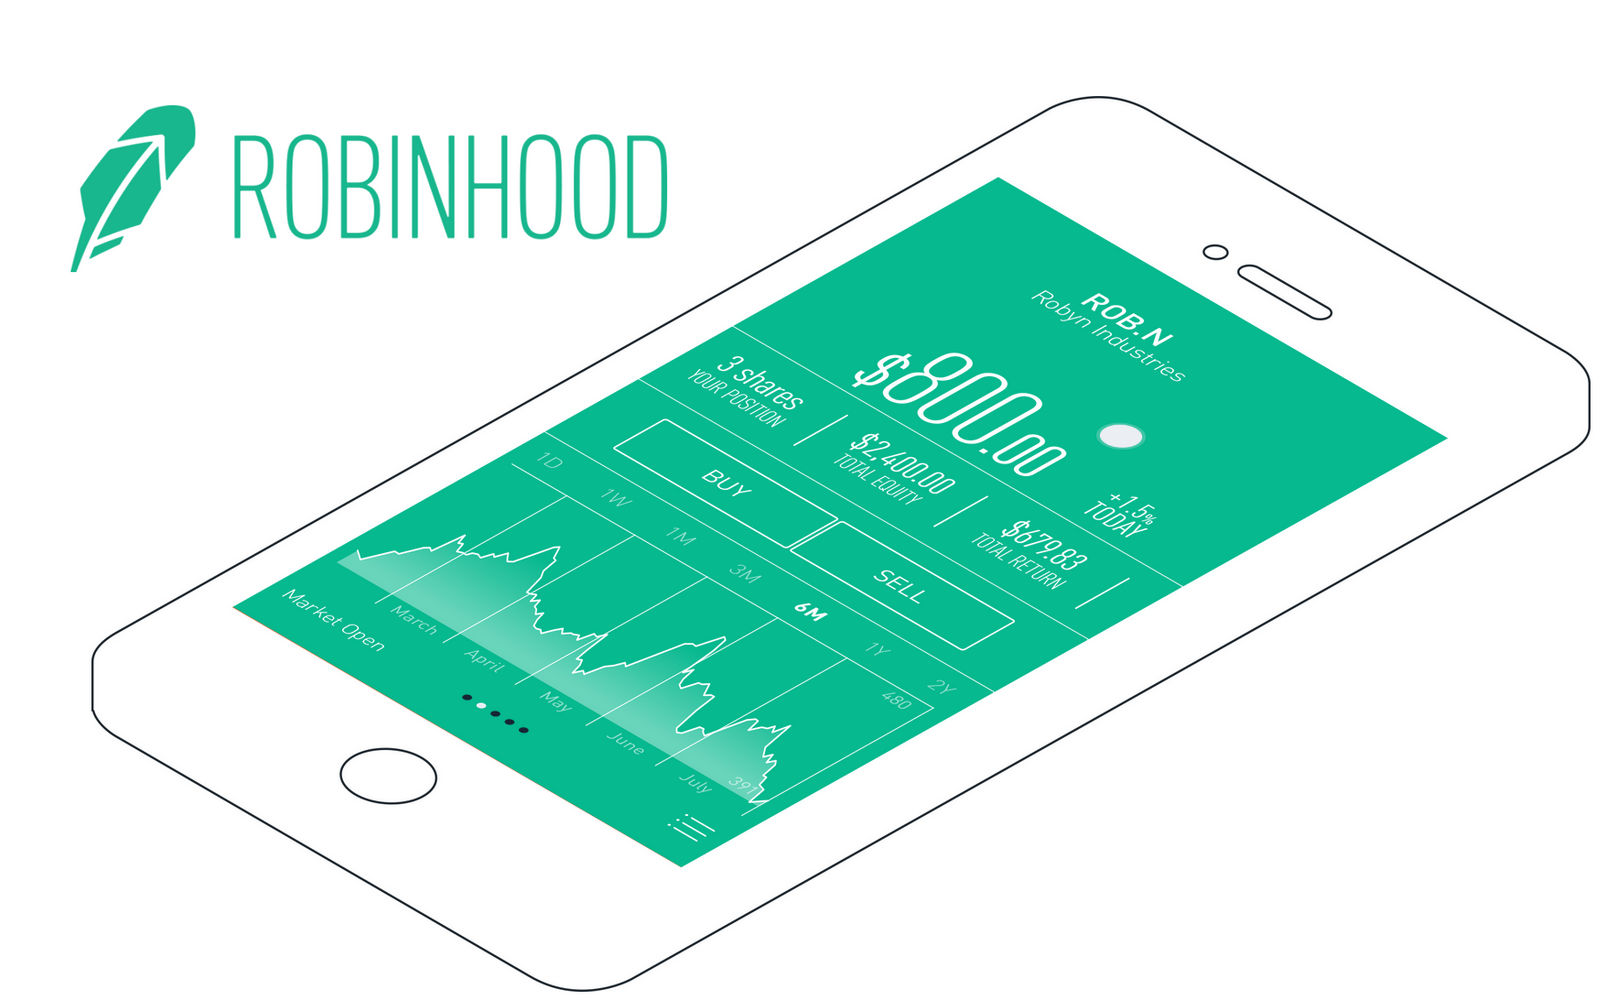 robinhood app will offer zero